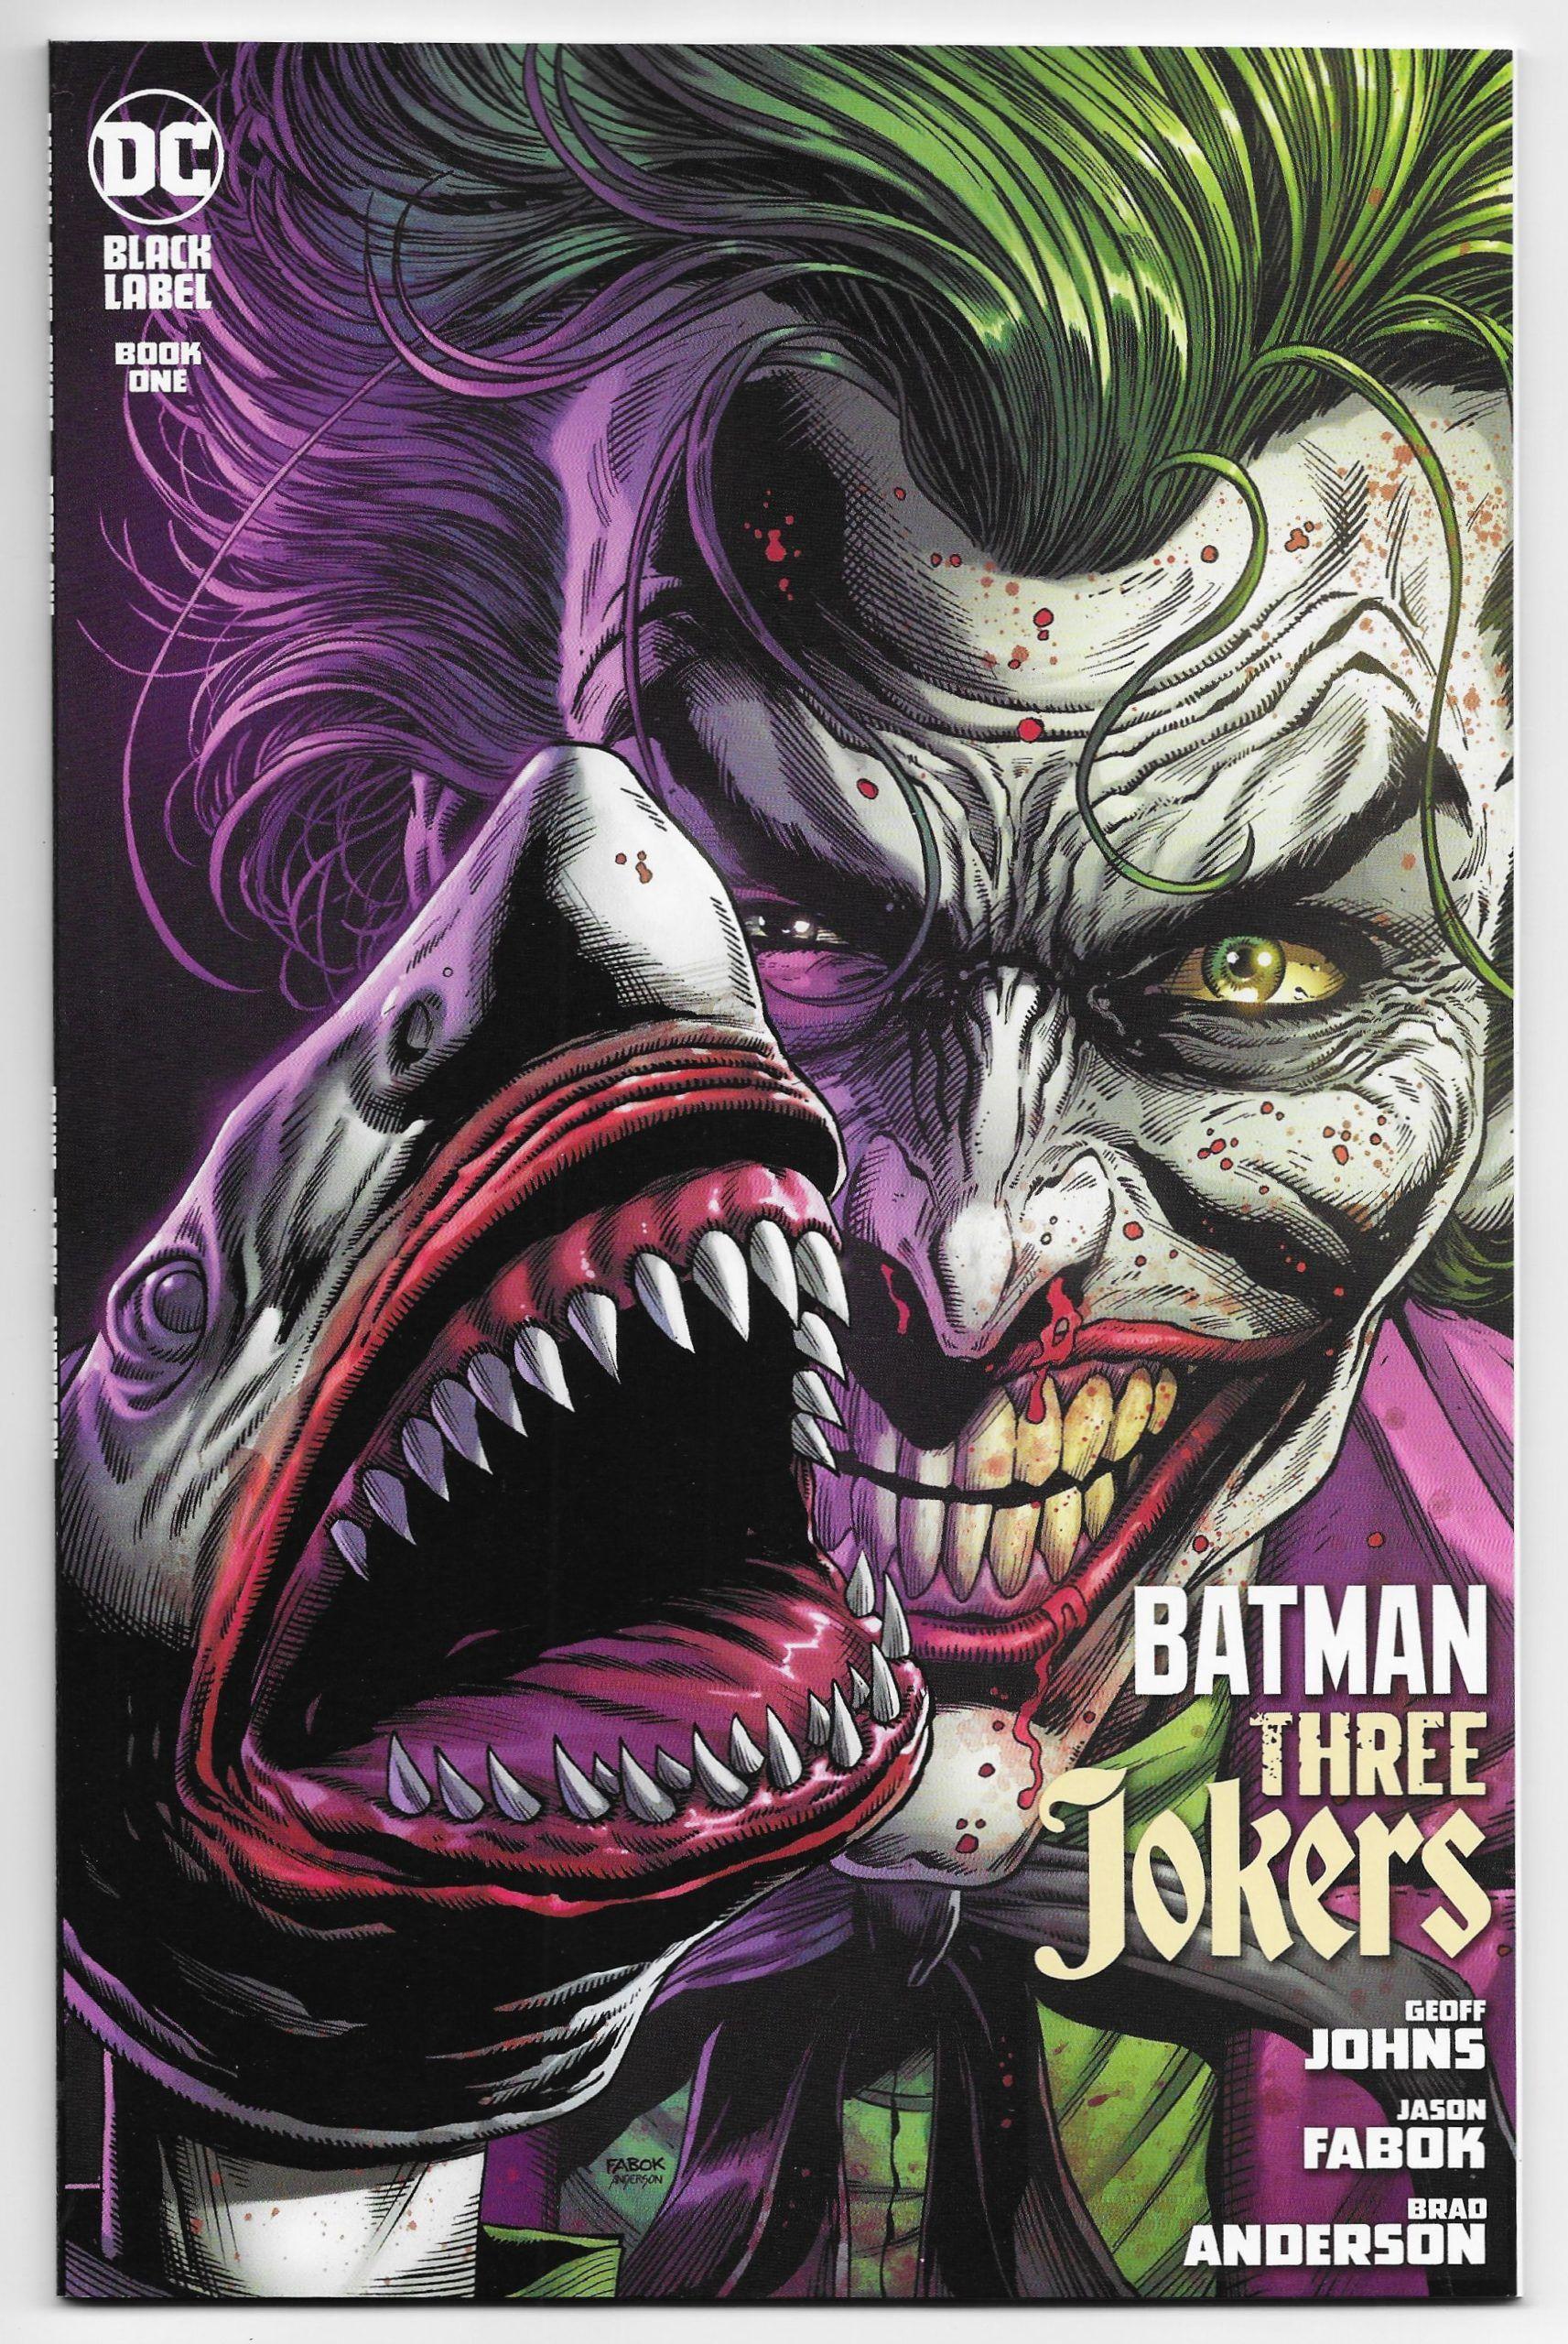 Batman Three Jokers 1 Joker Shark 2nd Printing Variant Dc 2020 Nm Joker Dc Comics Batman Joker Wallpaper Three Jokers